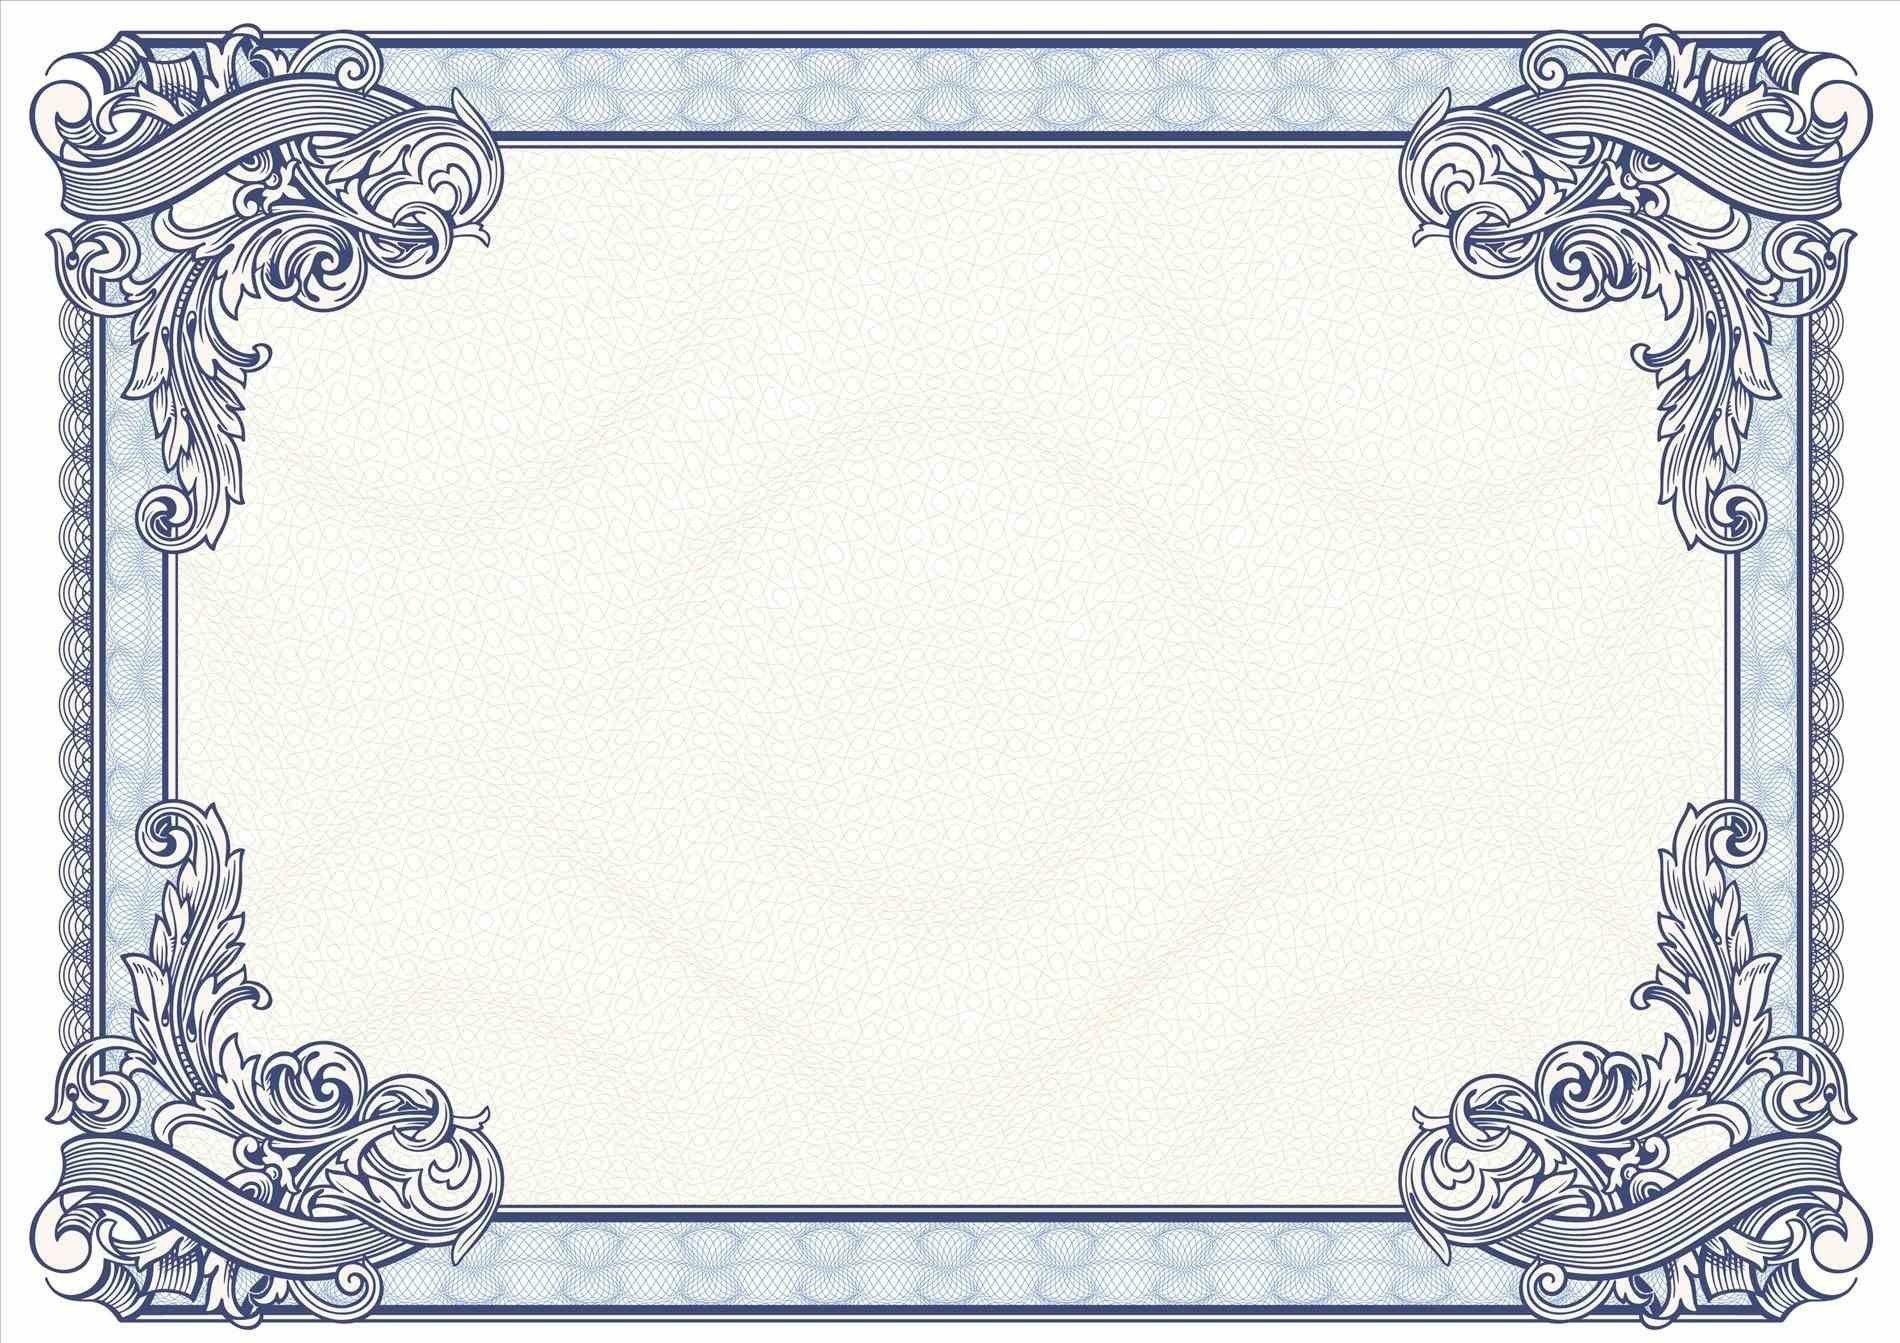 Certificate Borders Design Unique Certificate Border Design Throughout Certificate Border Design Templates